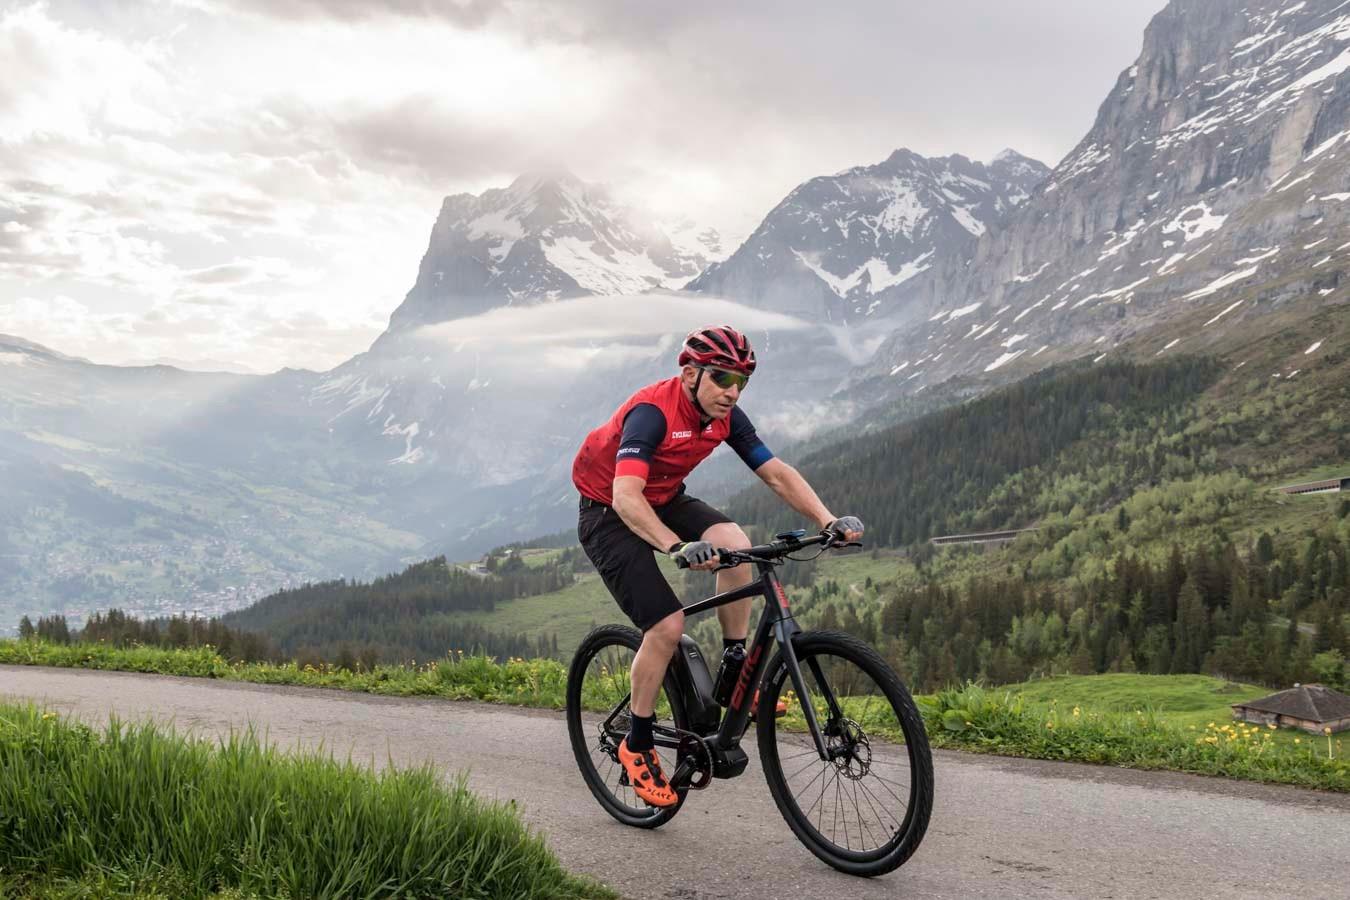 Thursday morning's early start meant tackling the 1,000m, 10km climb of the Kleine Scheidegg on the Alpenchallenge AMP Cross LTD